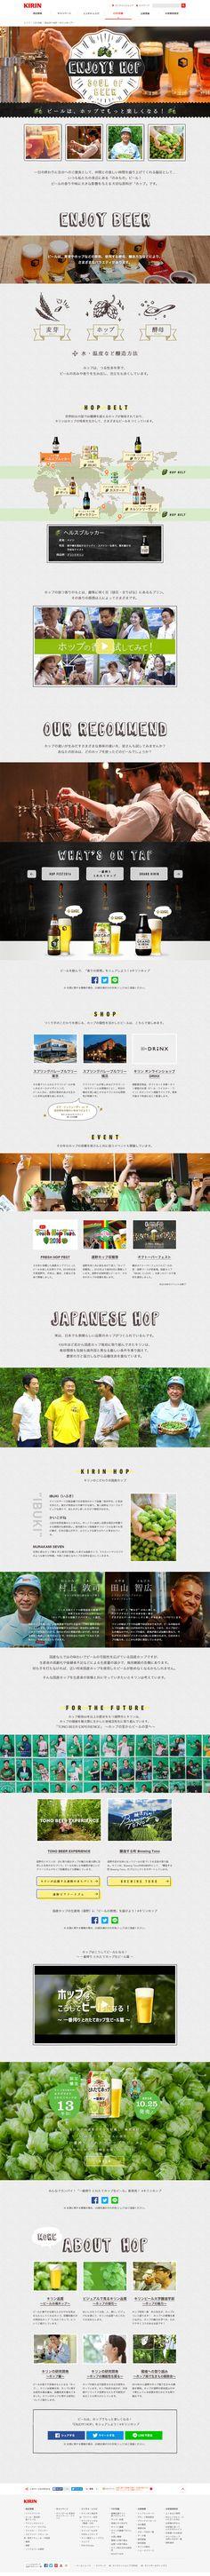 ENJOY! HOP【飲料・お酒関連】のLPデザイン。WEBデザイナーさん必見!ランディングページのデザイン参考に()